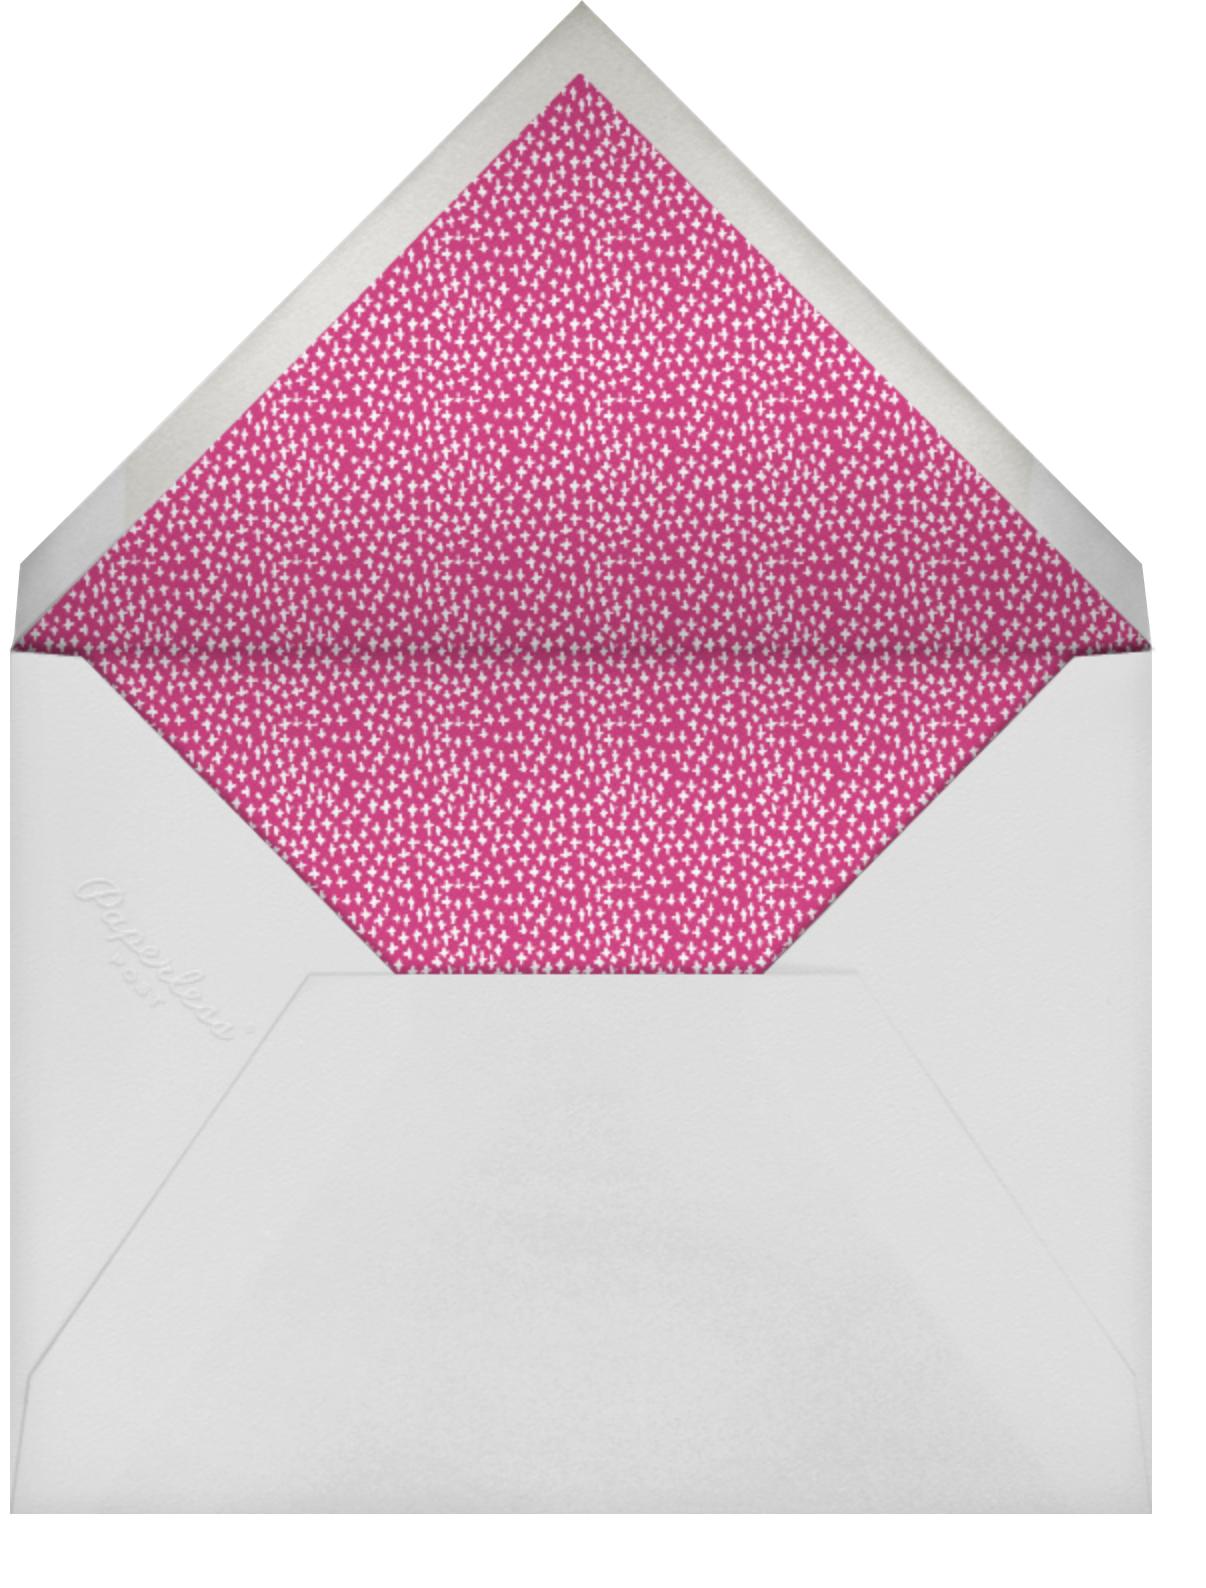 Miss Ivy - Mr. Boddington's Studio - Adult birthday - envelope back